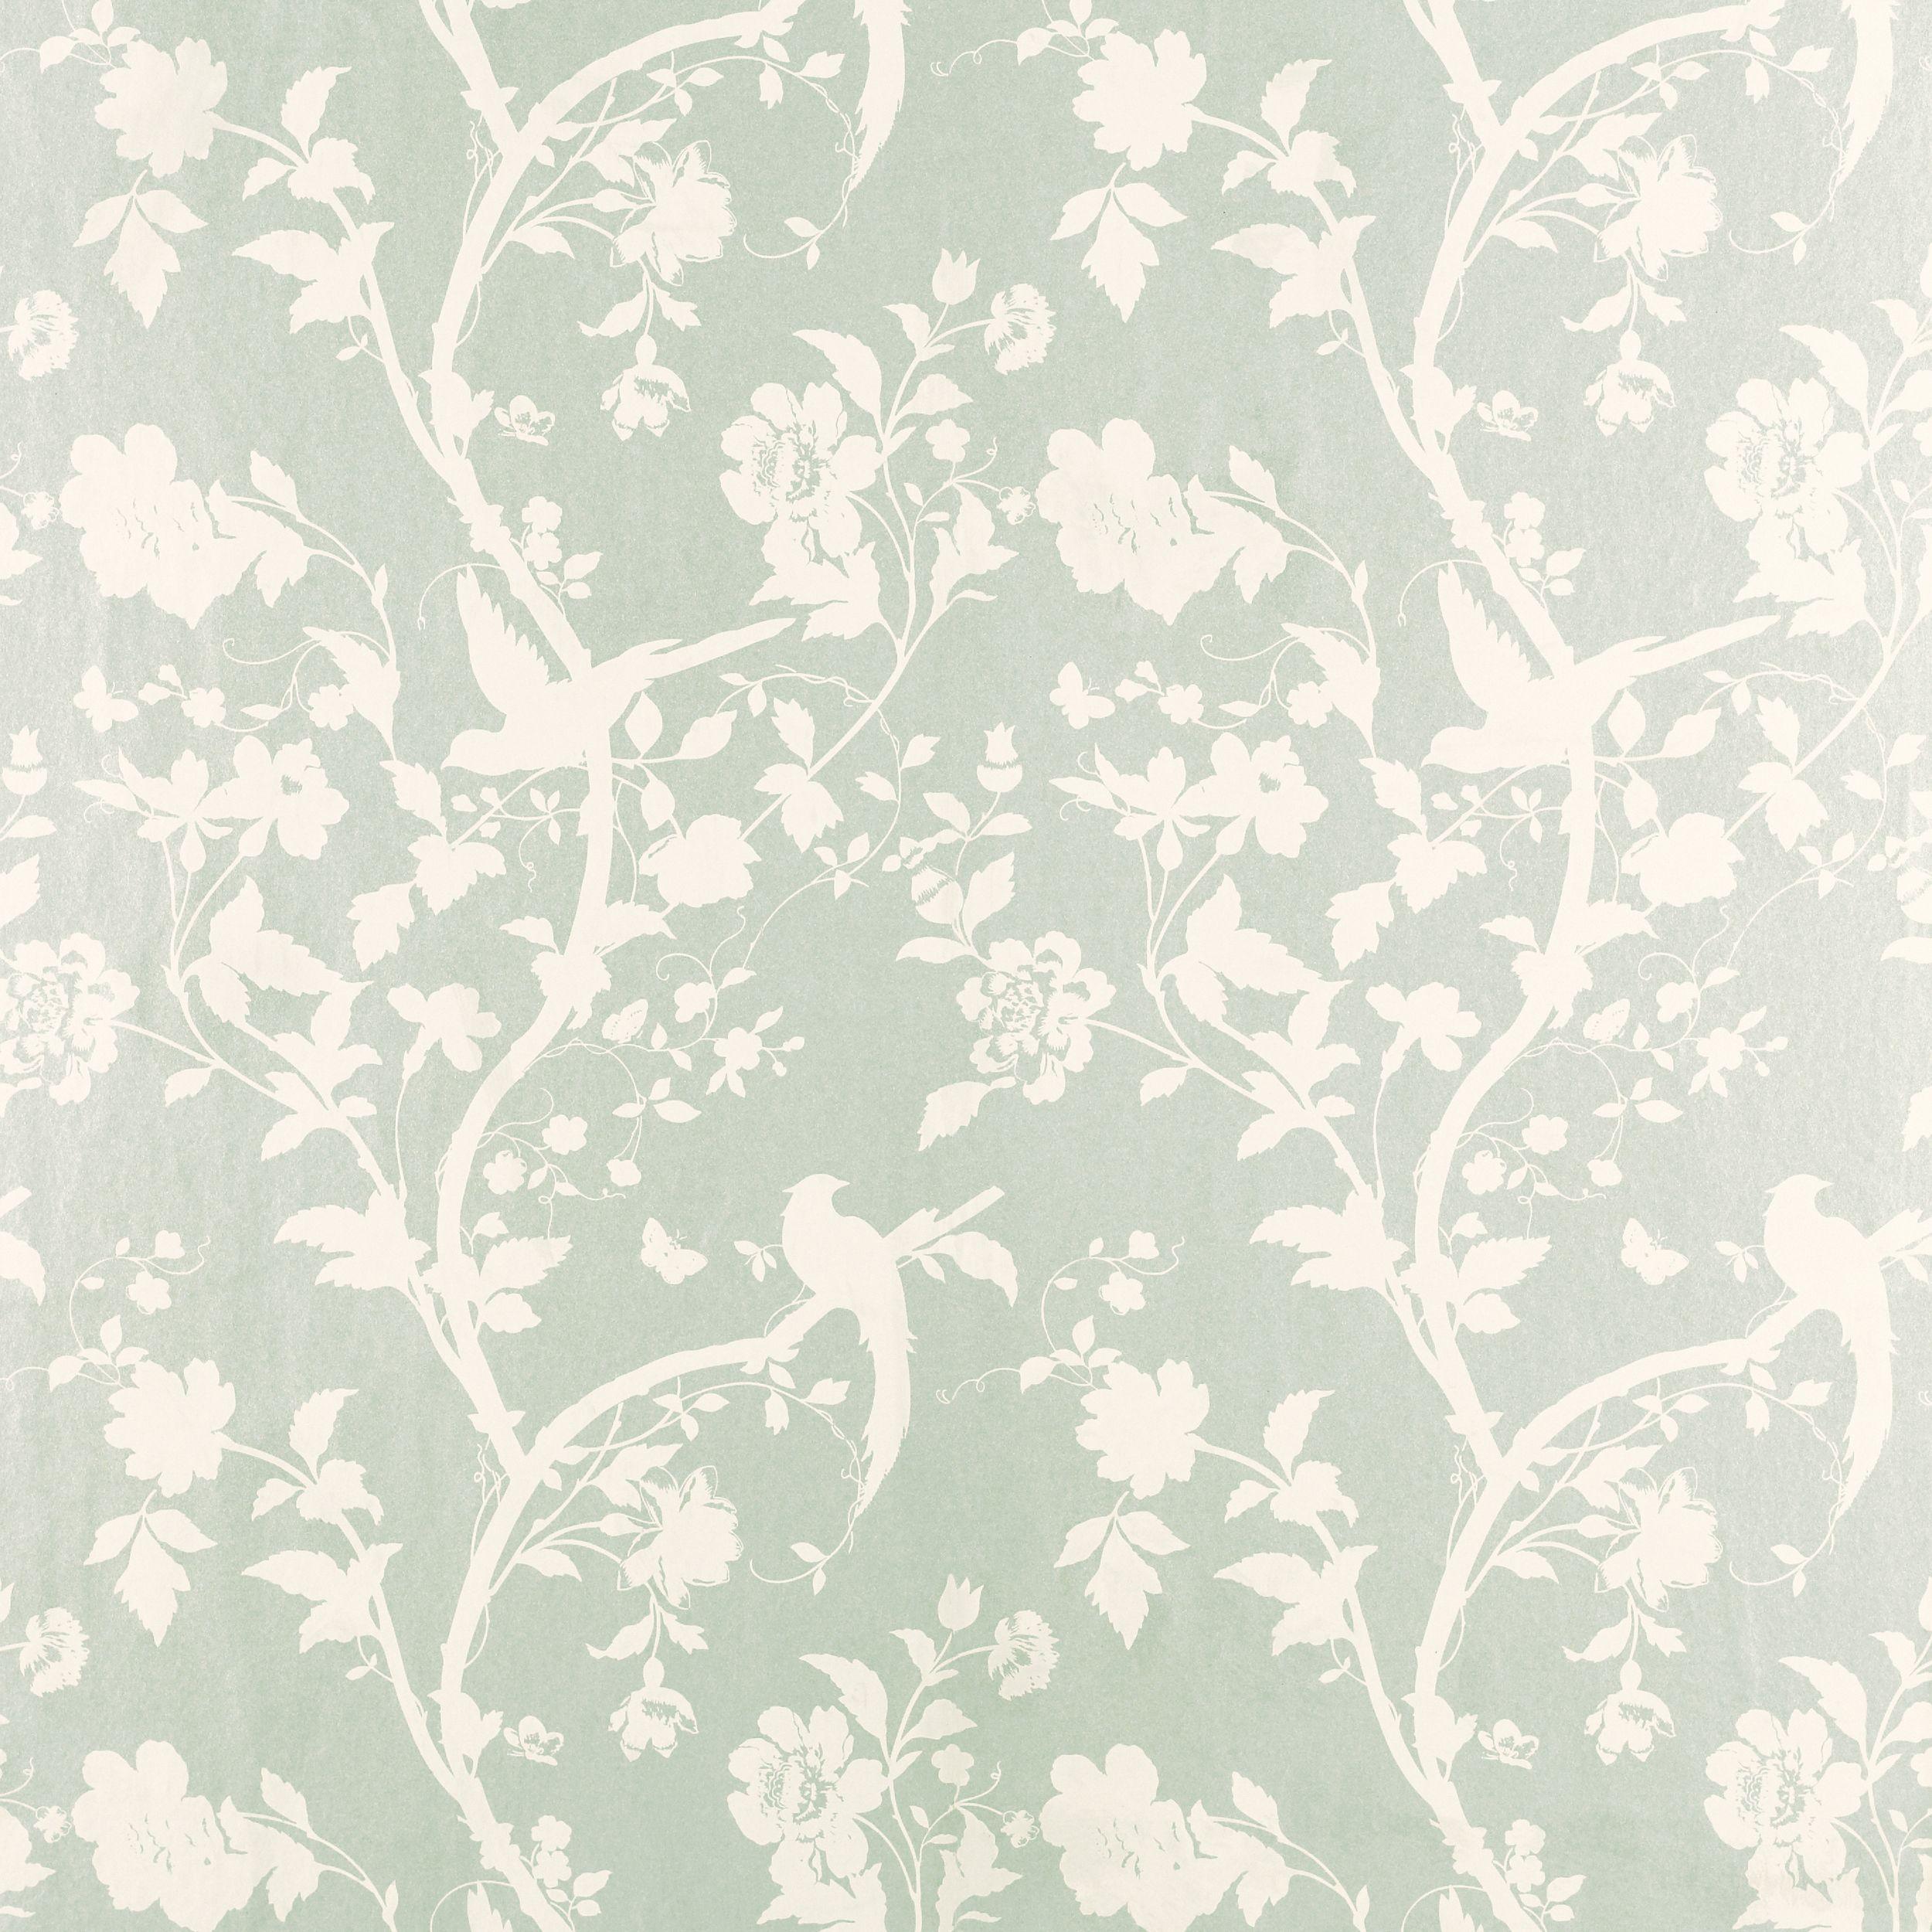 Laura Ashley Kitchen Wallpaper: Washable Wallpaper